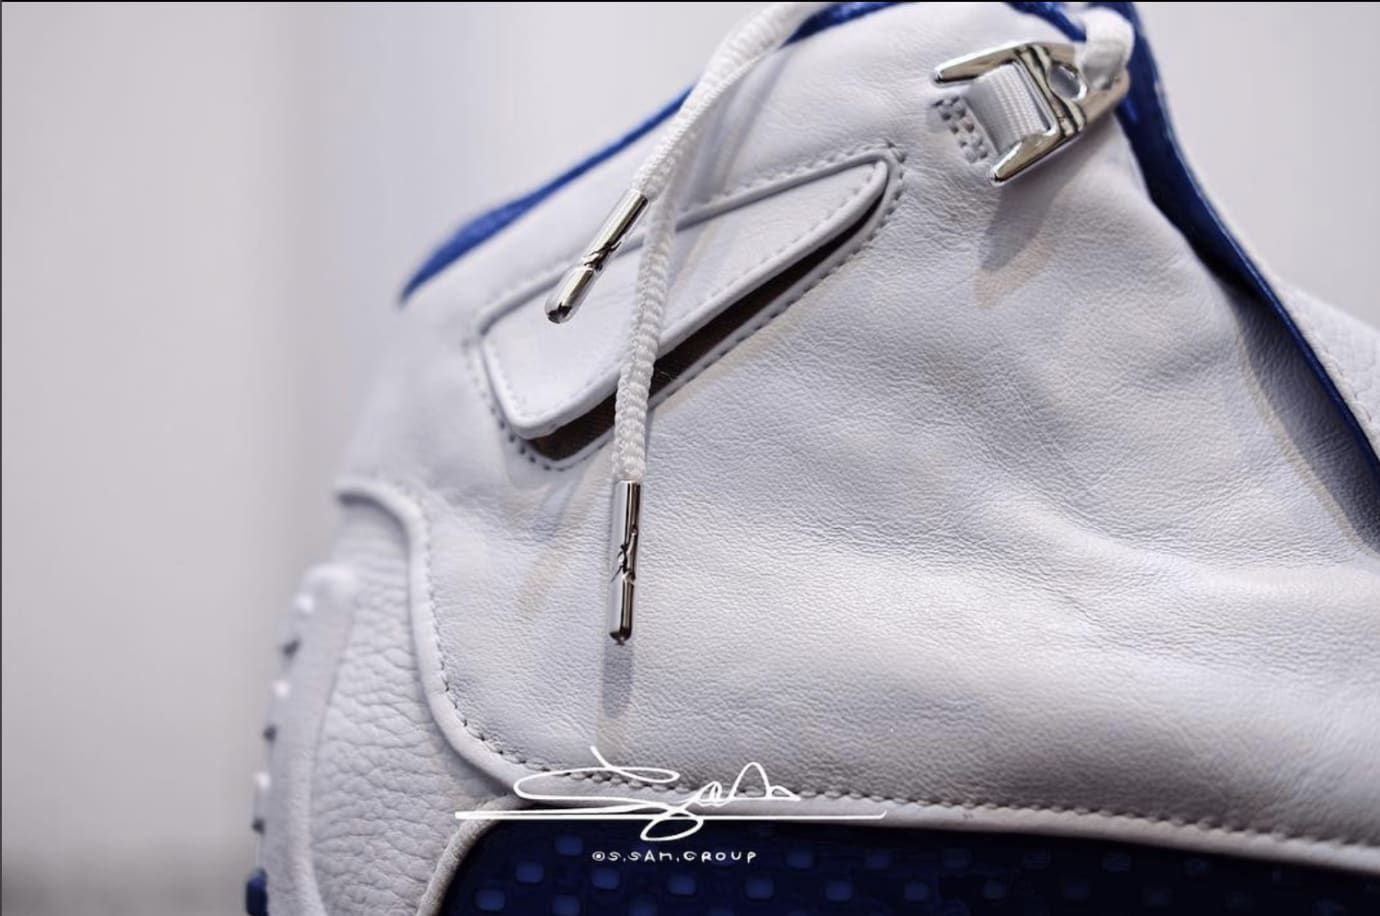 Air Jordan 18 White/Sport Royal-White-Metallic Silver AA2494-106 (Detail 1)